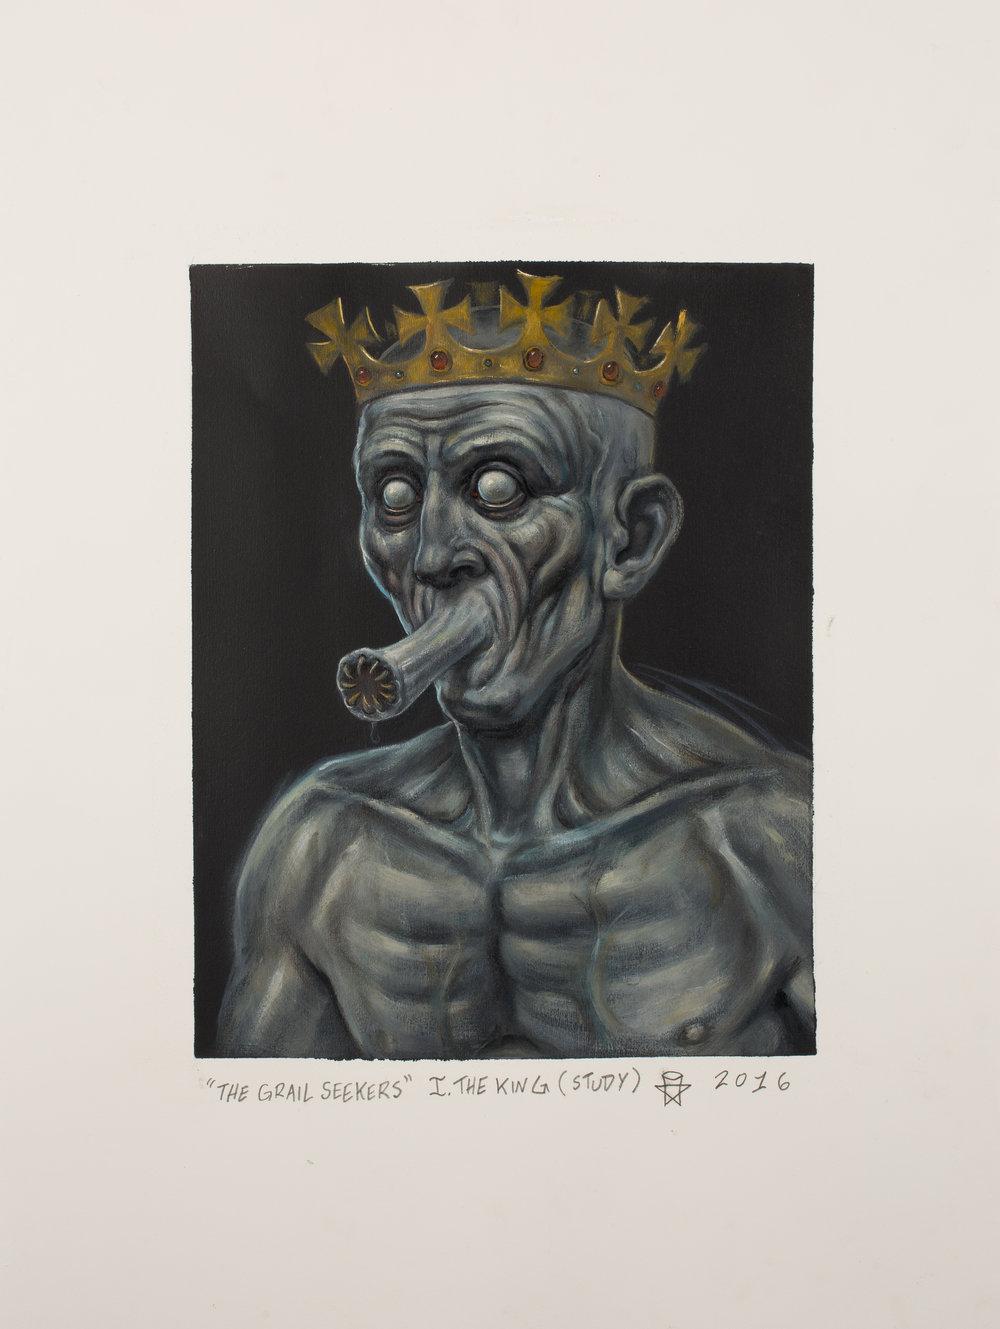 Ulrich-king.study.jpg